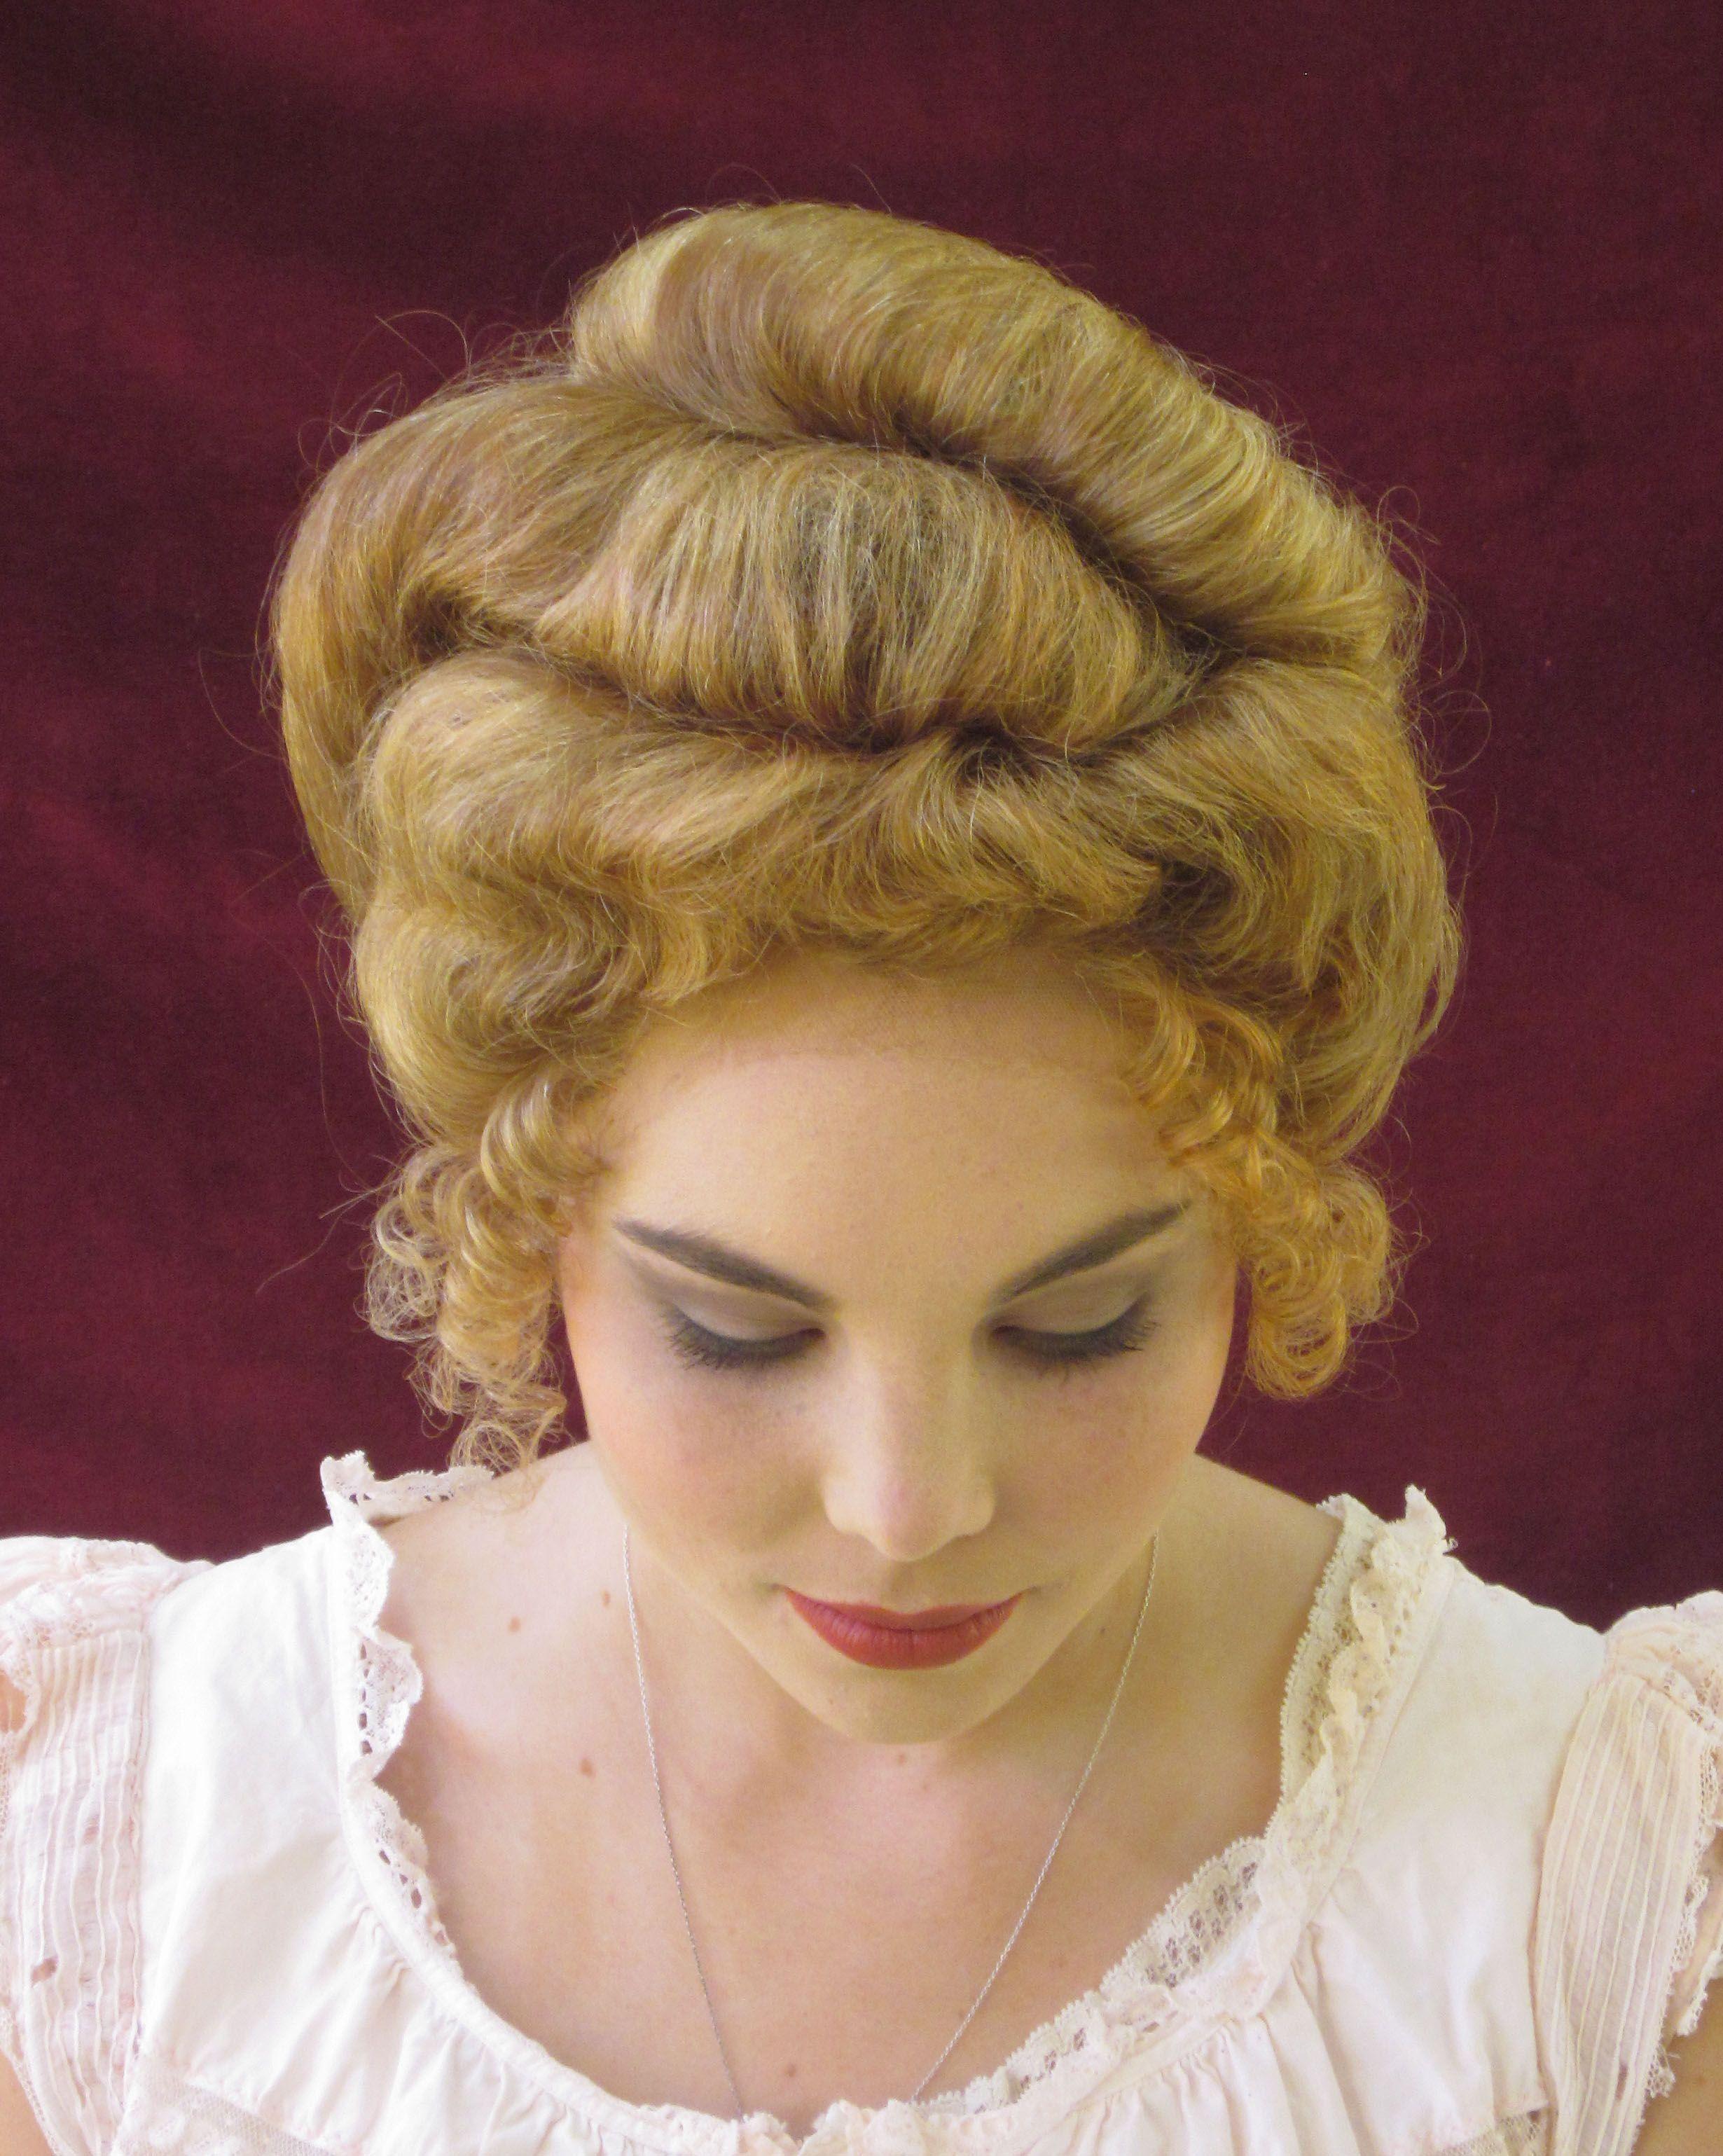 1890's hairstyle melanie